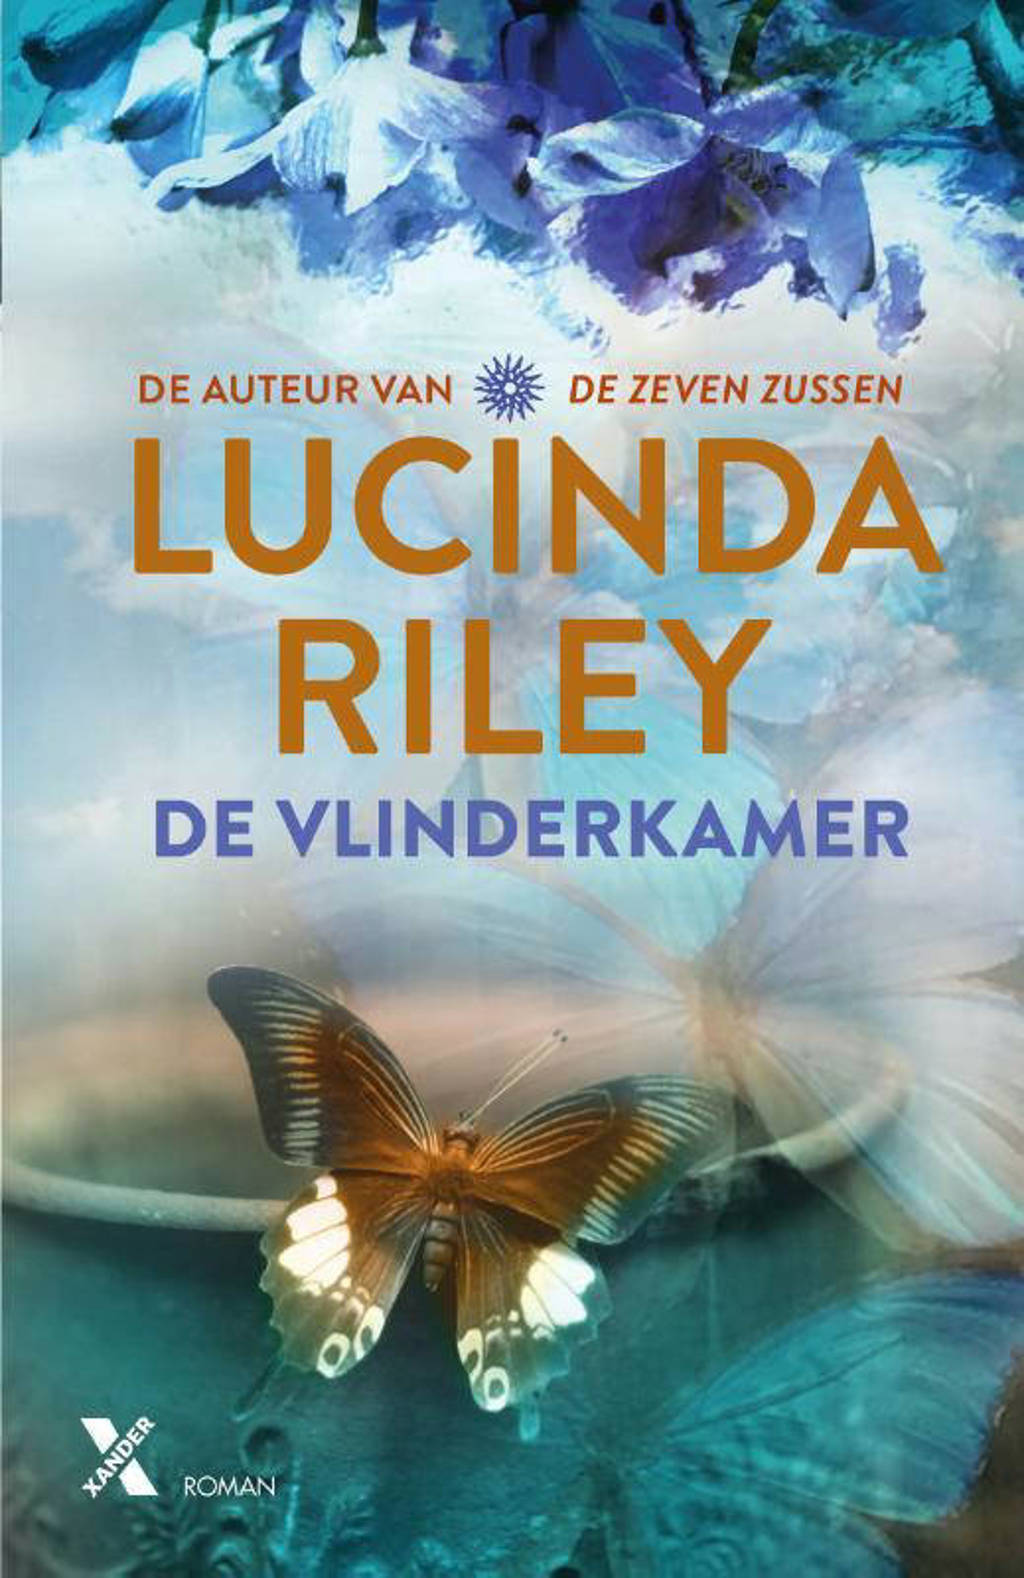 De vlinderkamer - Lucinda Riley